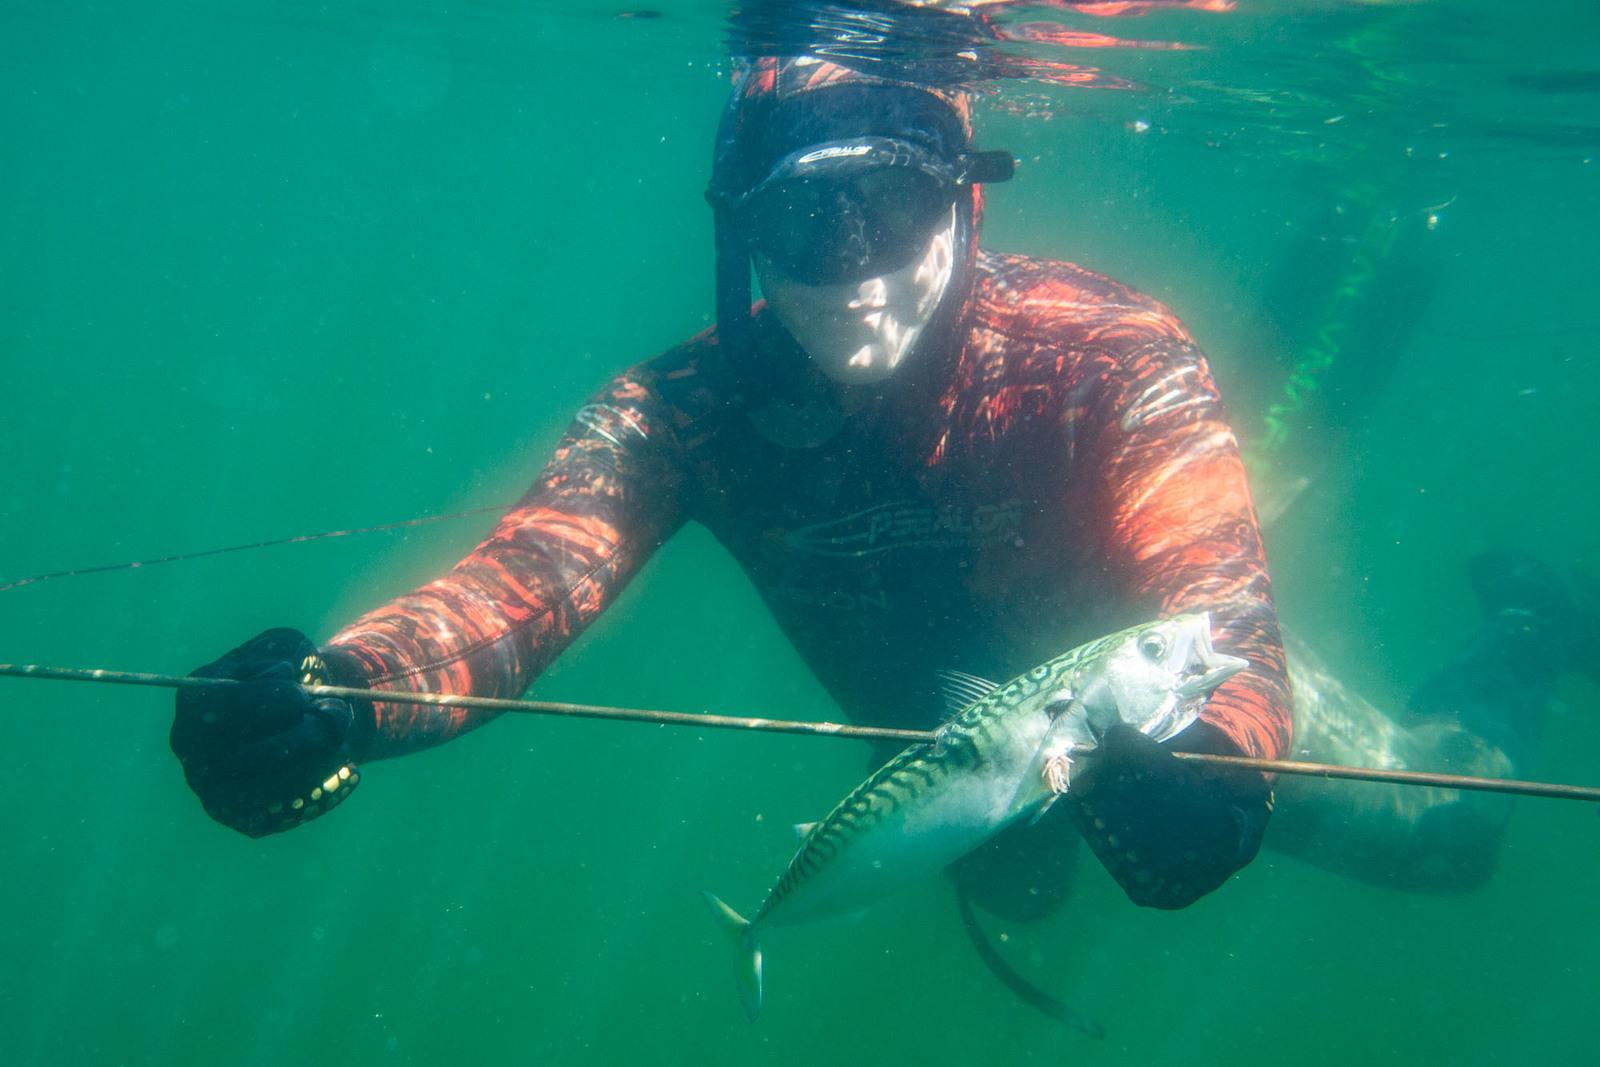 R4B3593 - Harpunfiskeri - hvordan er reglerne?